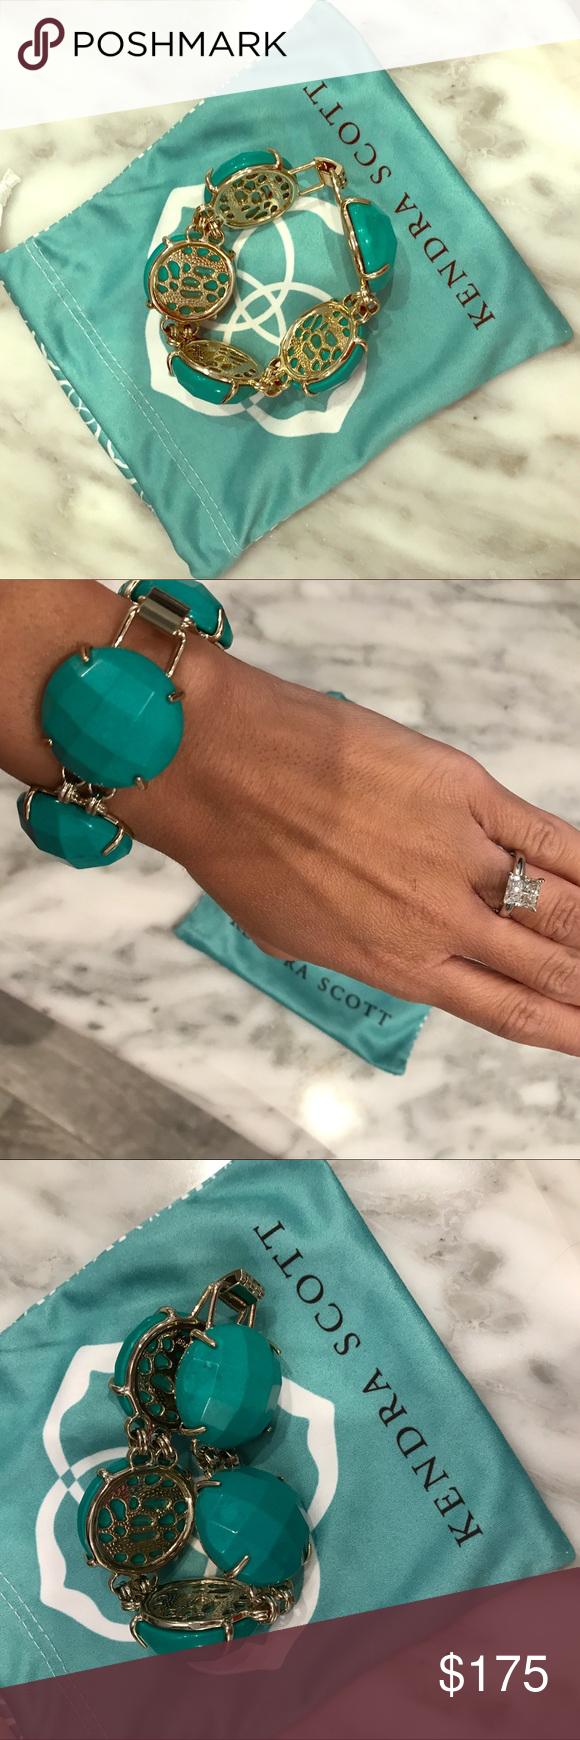 Kendra scott k gold plated green stone bracelet green stone